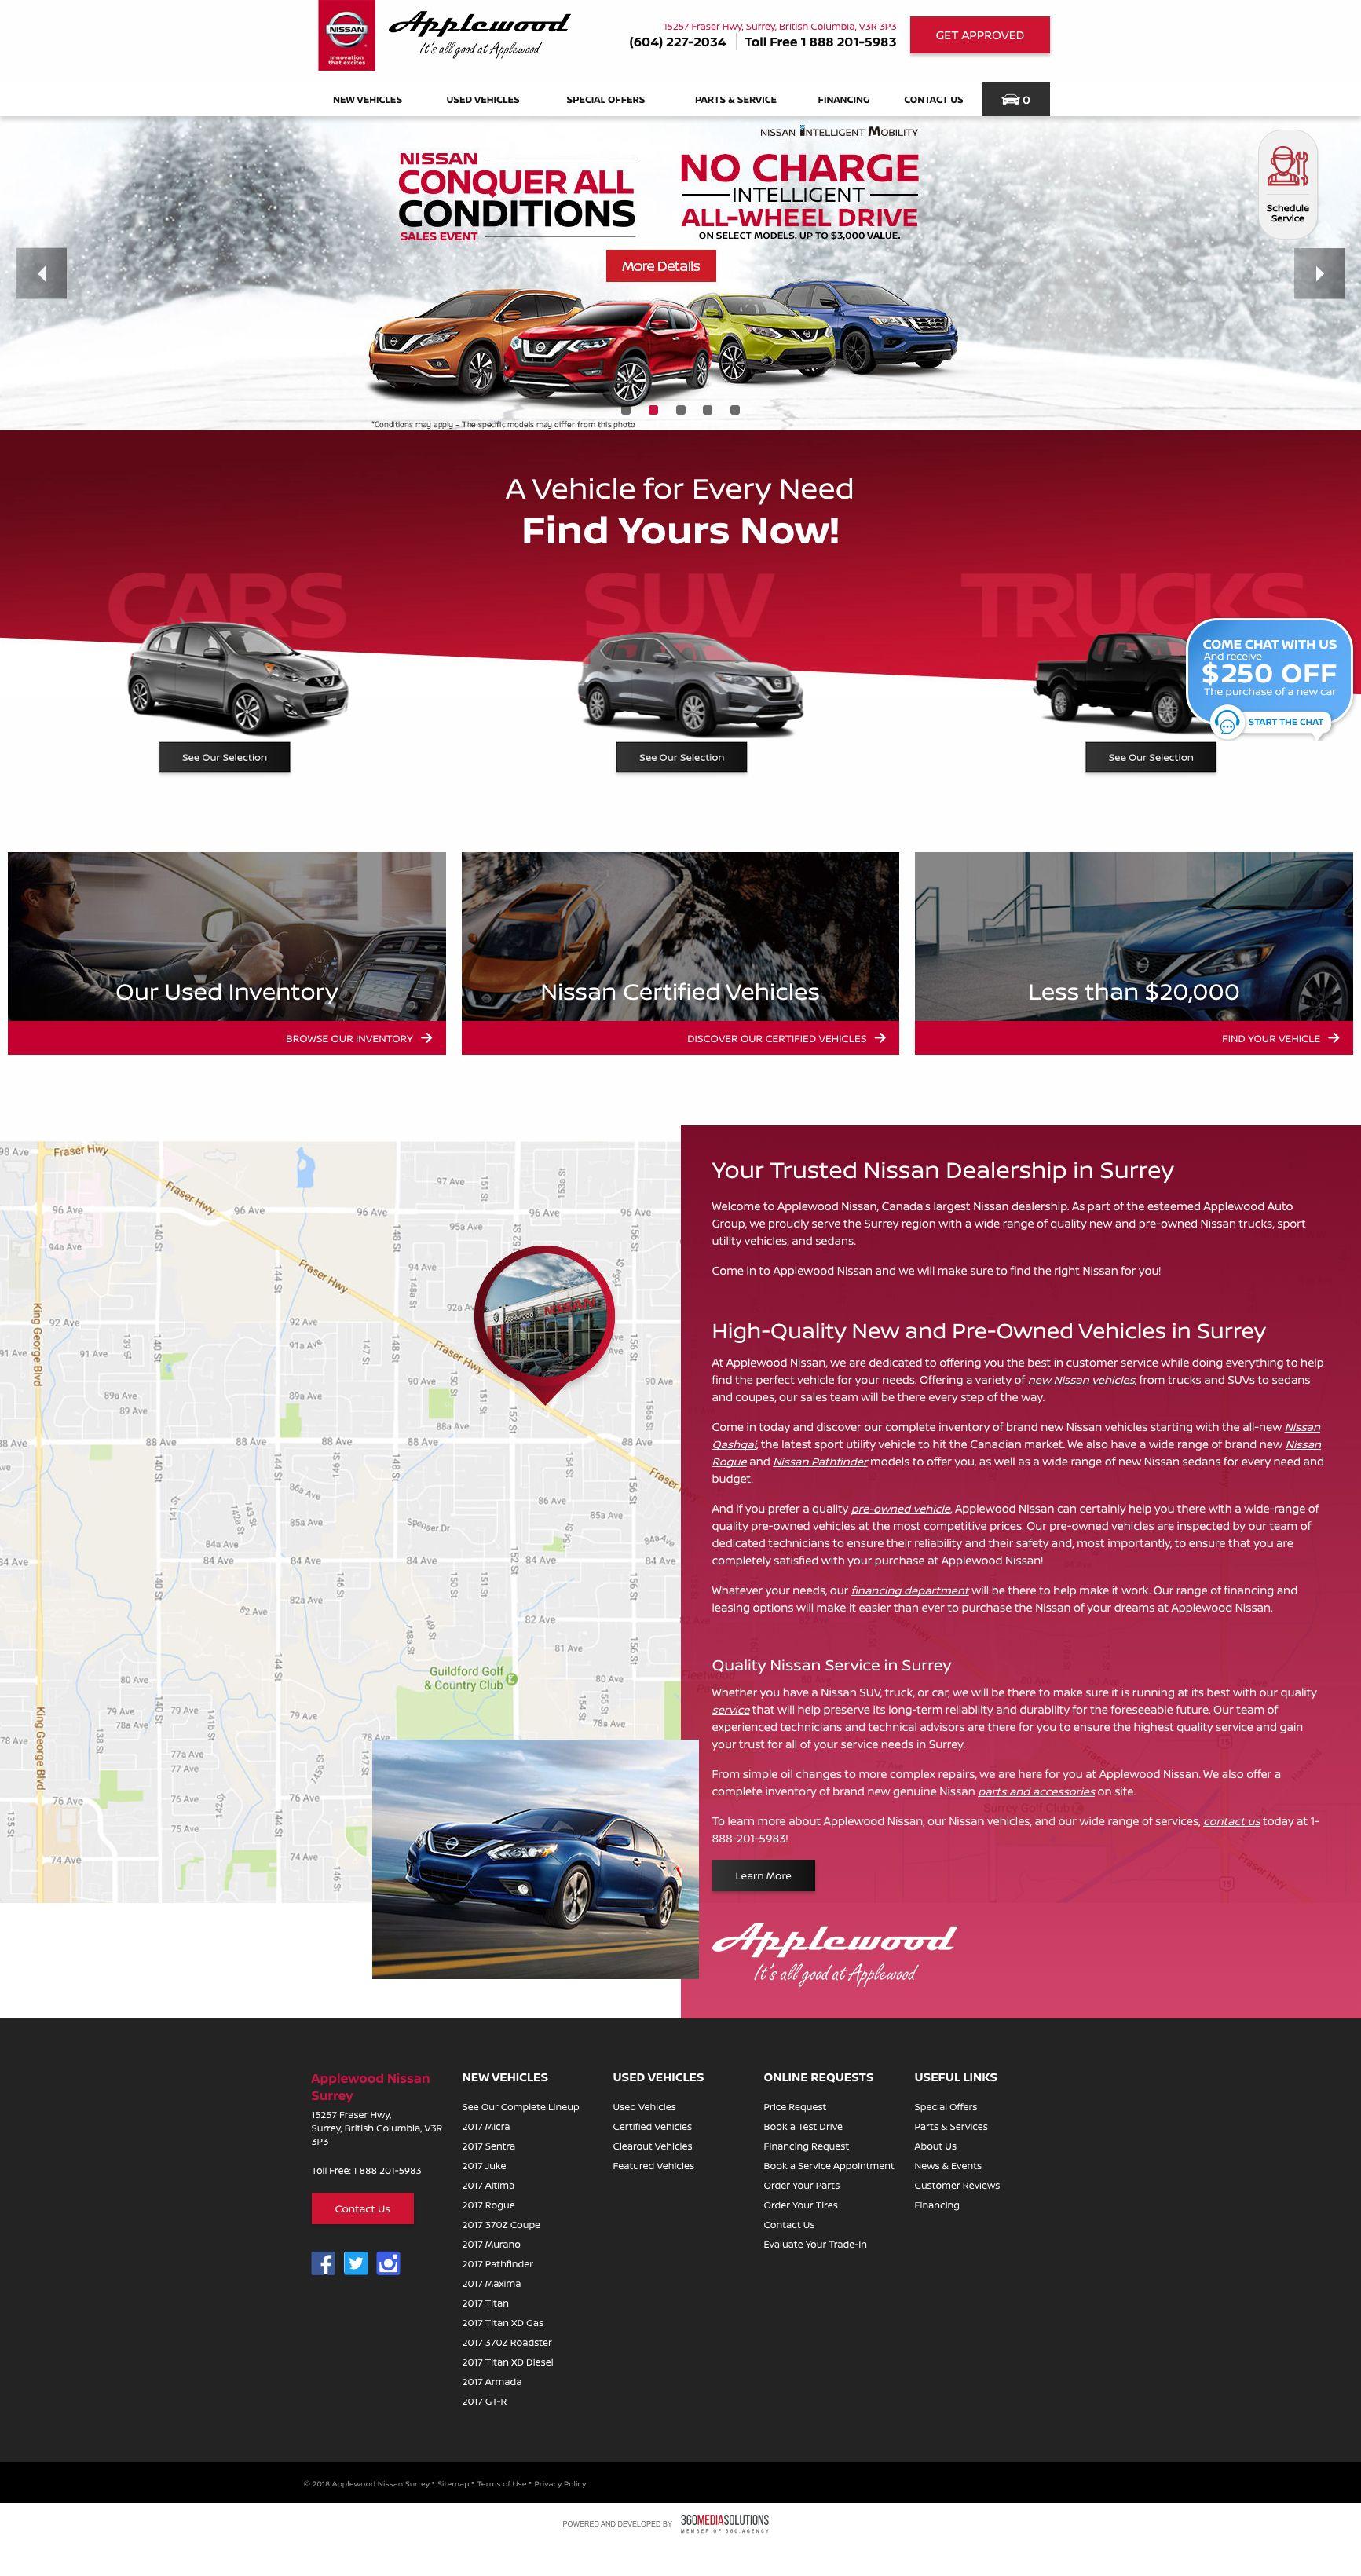 Best Promotional Design For Car Dealers Get Inspired Today Webdesign Design Graphicdesign Car Websites Agency 360agency Design Creative Inspiration